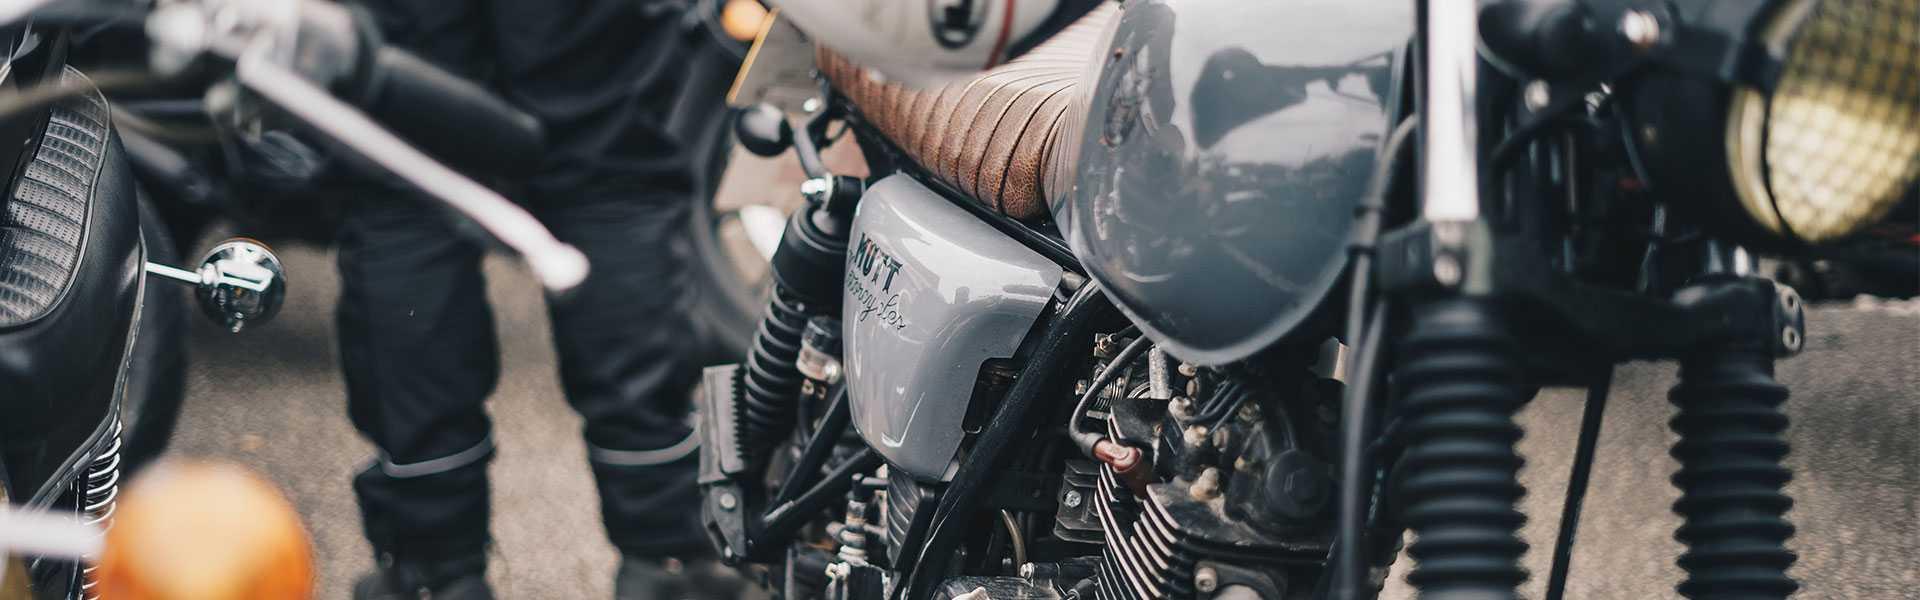 conduire une moto avec le permis B